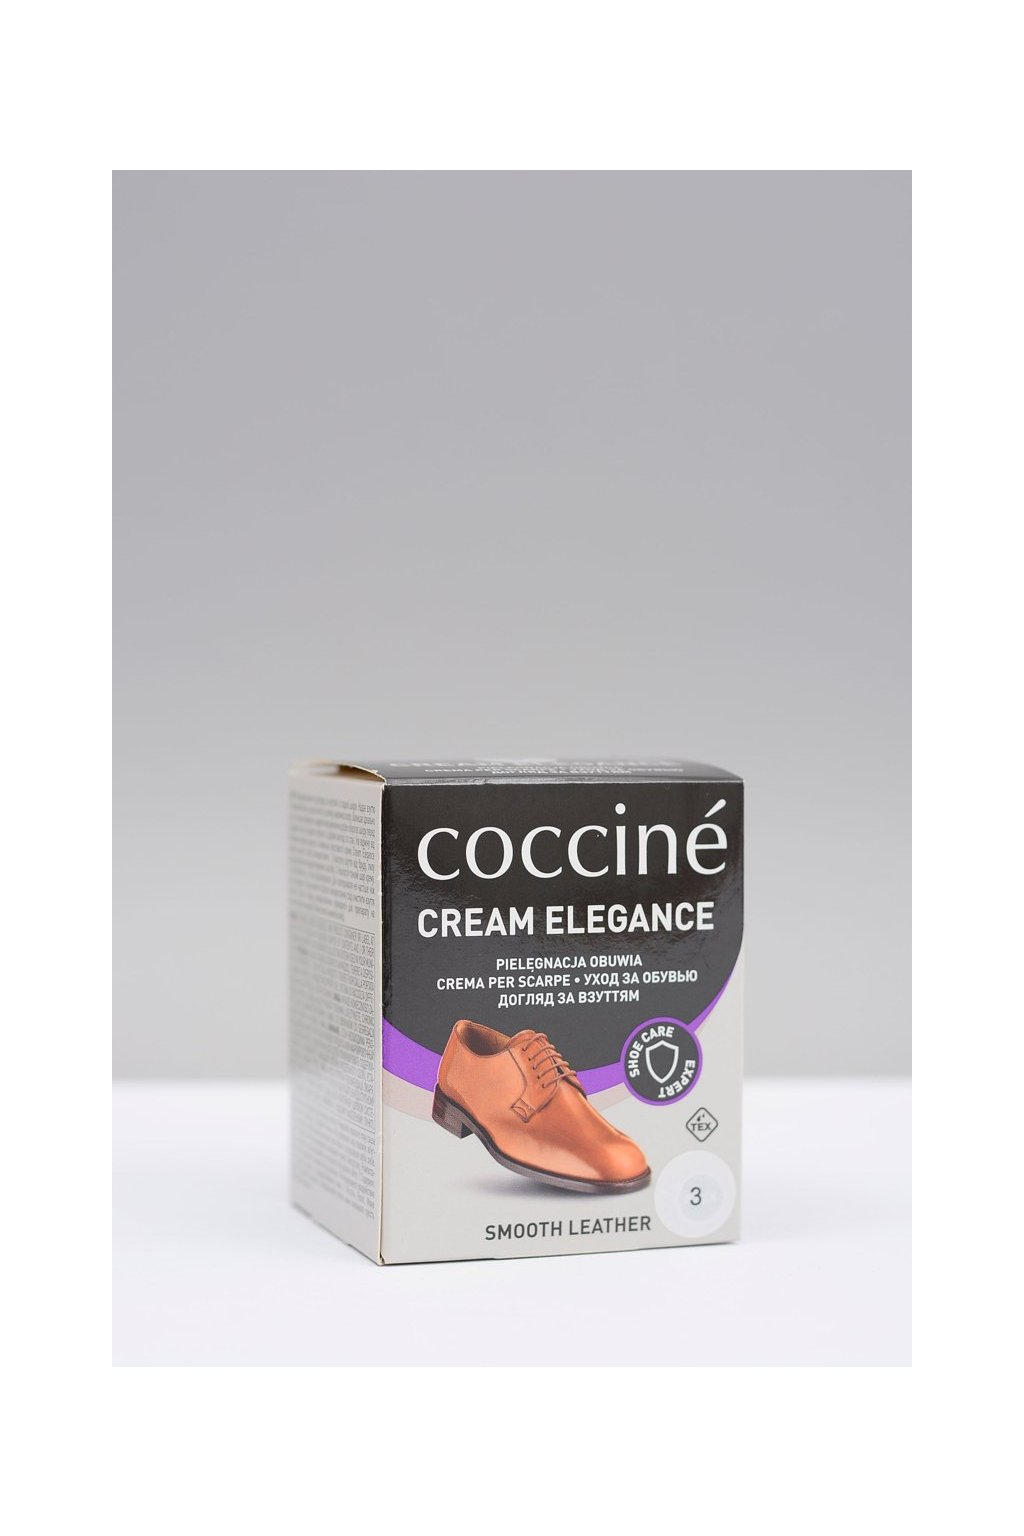 Coccine Cream Elegance pasta s voskom na kožu